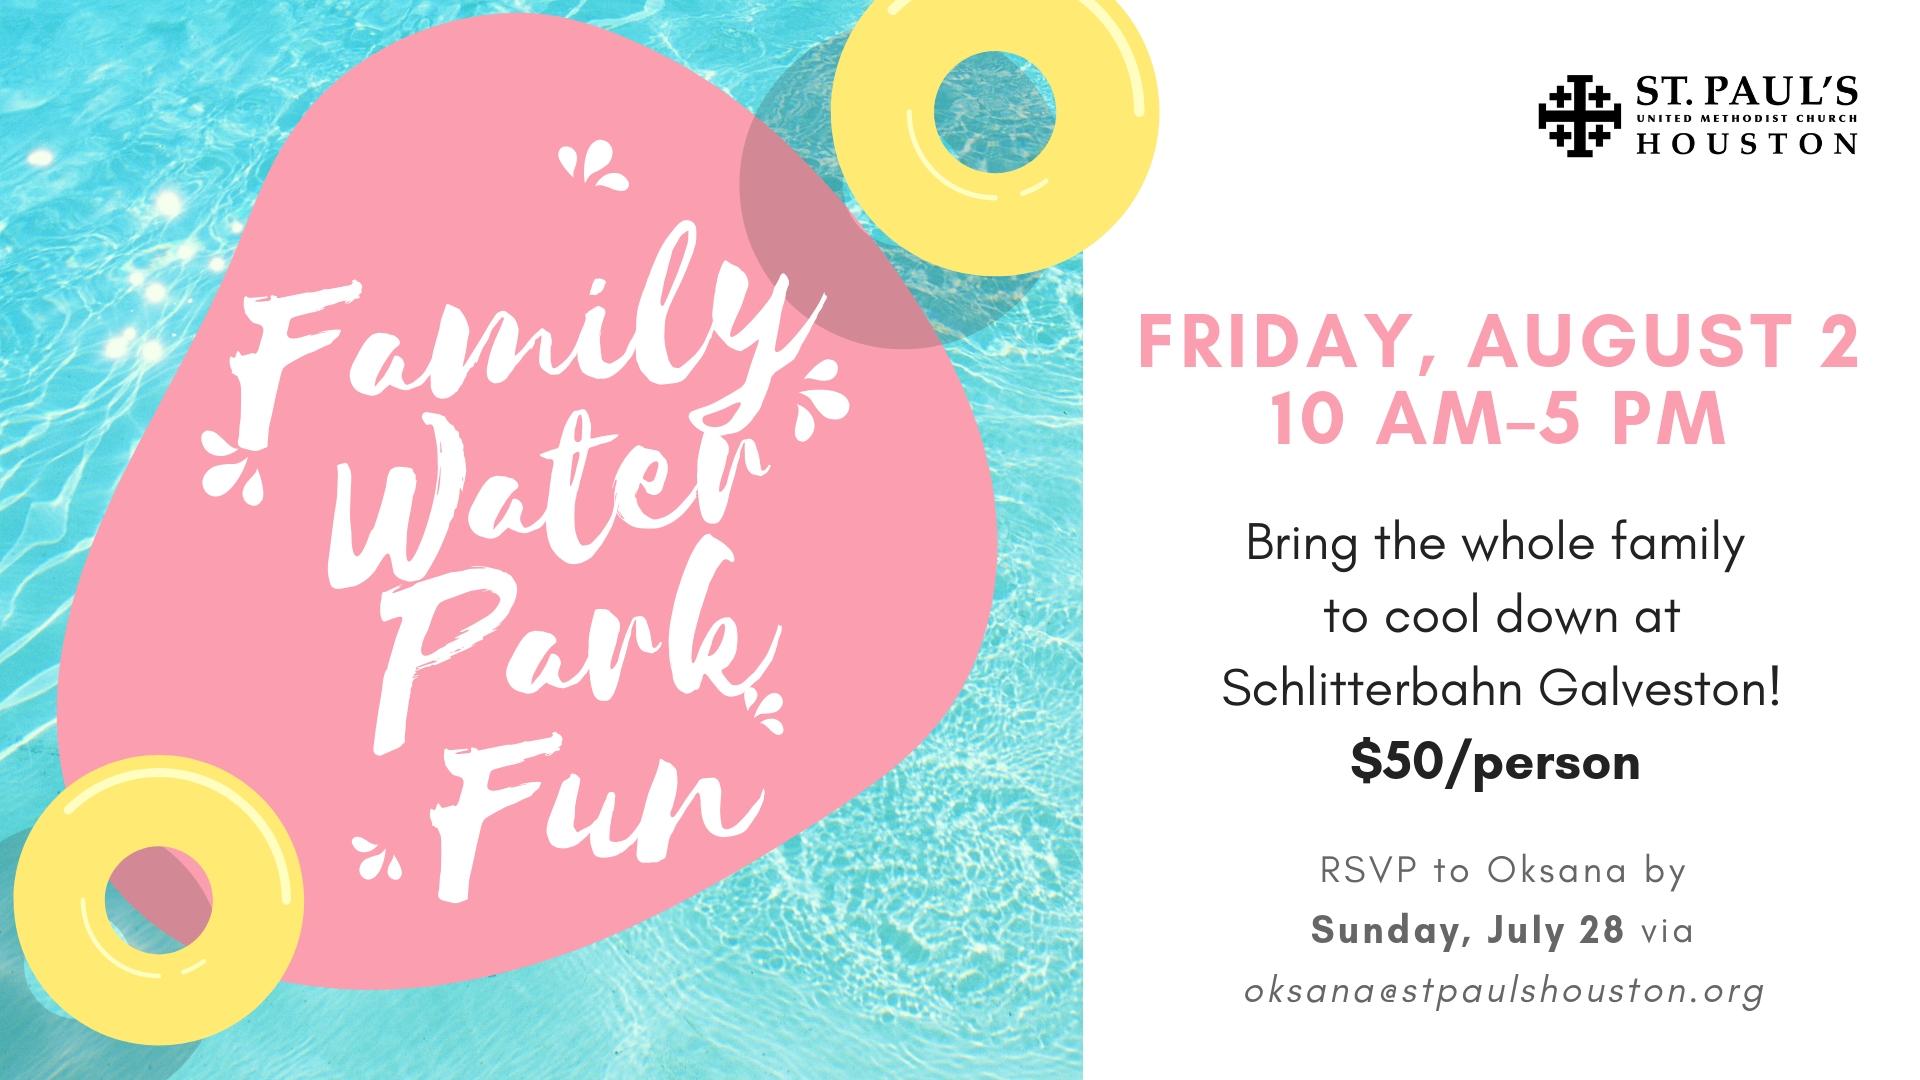 16x9 Family Water Park Fun - Aug 2019.jpg